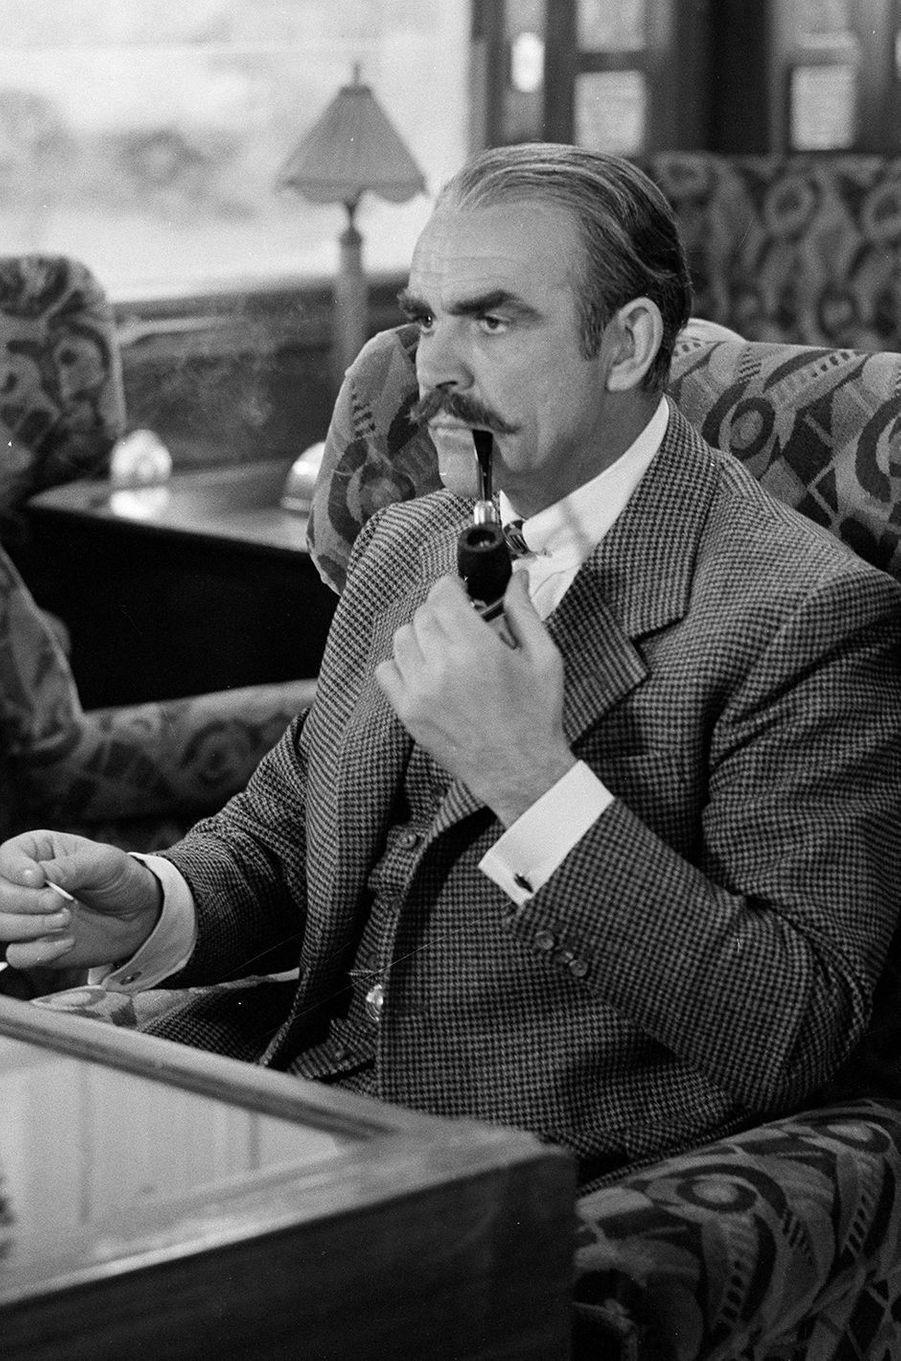 1974 : Sean Connery dans «Le crime de l'Orient Express» de Sidney Lumet avec Albert Finney, Ingrid Bergman, Lauren Bacall